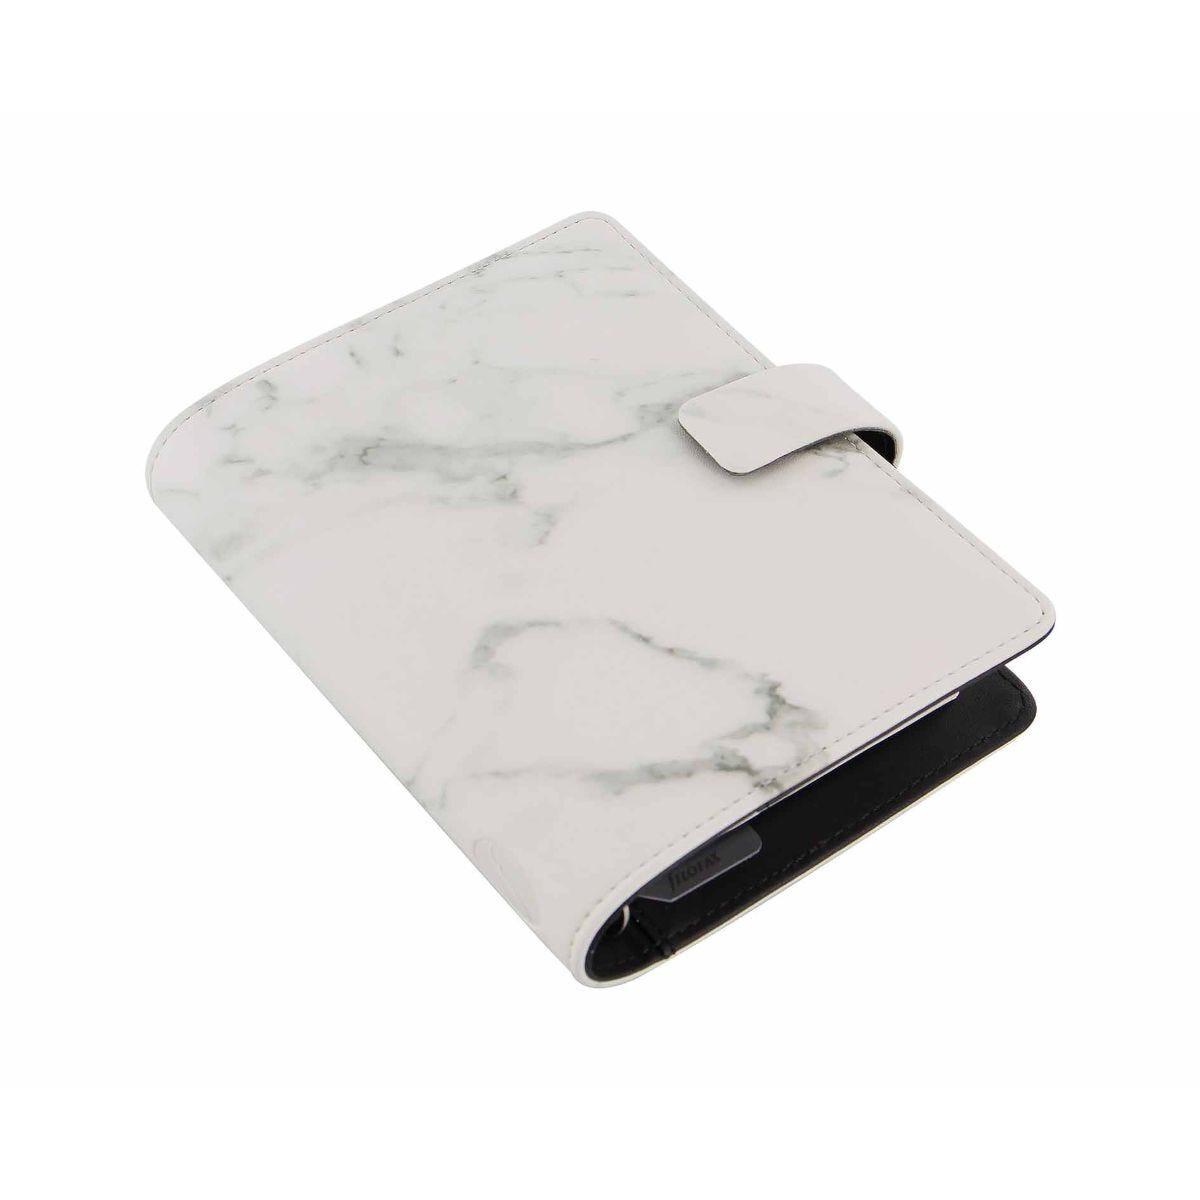 Filofax Organiser Pocket Marble